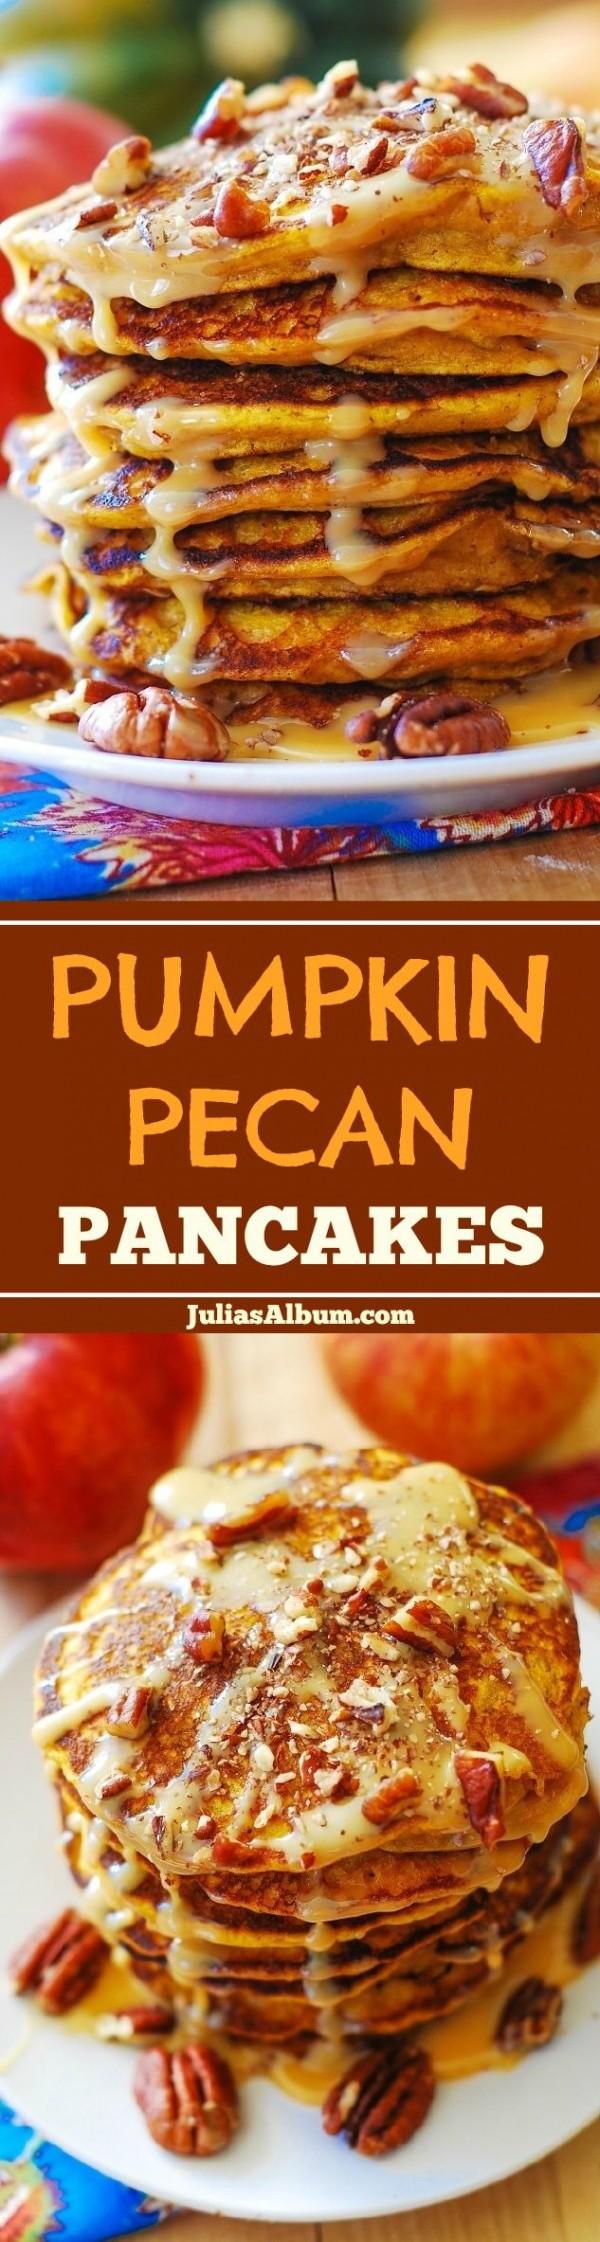 Get the recipe Pumpkin Pecan Pancakes @recipes_to_go